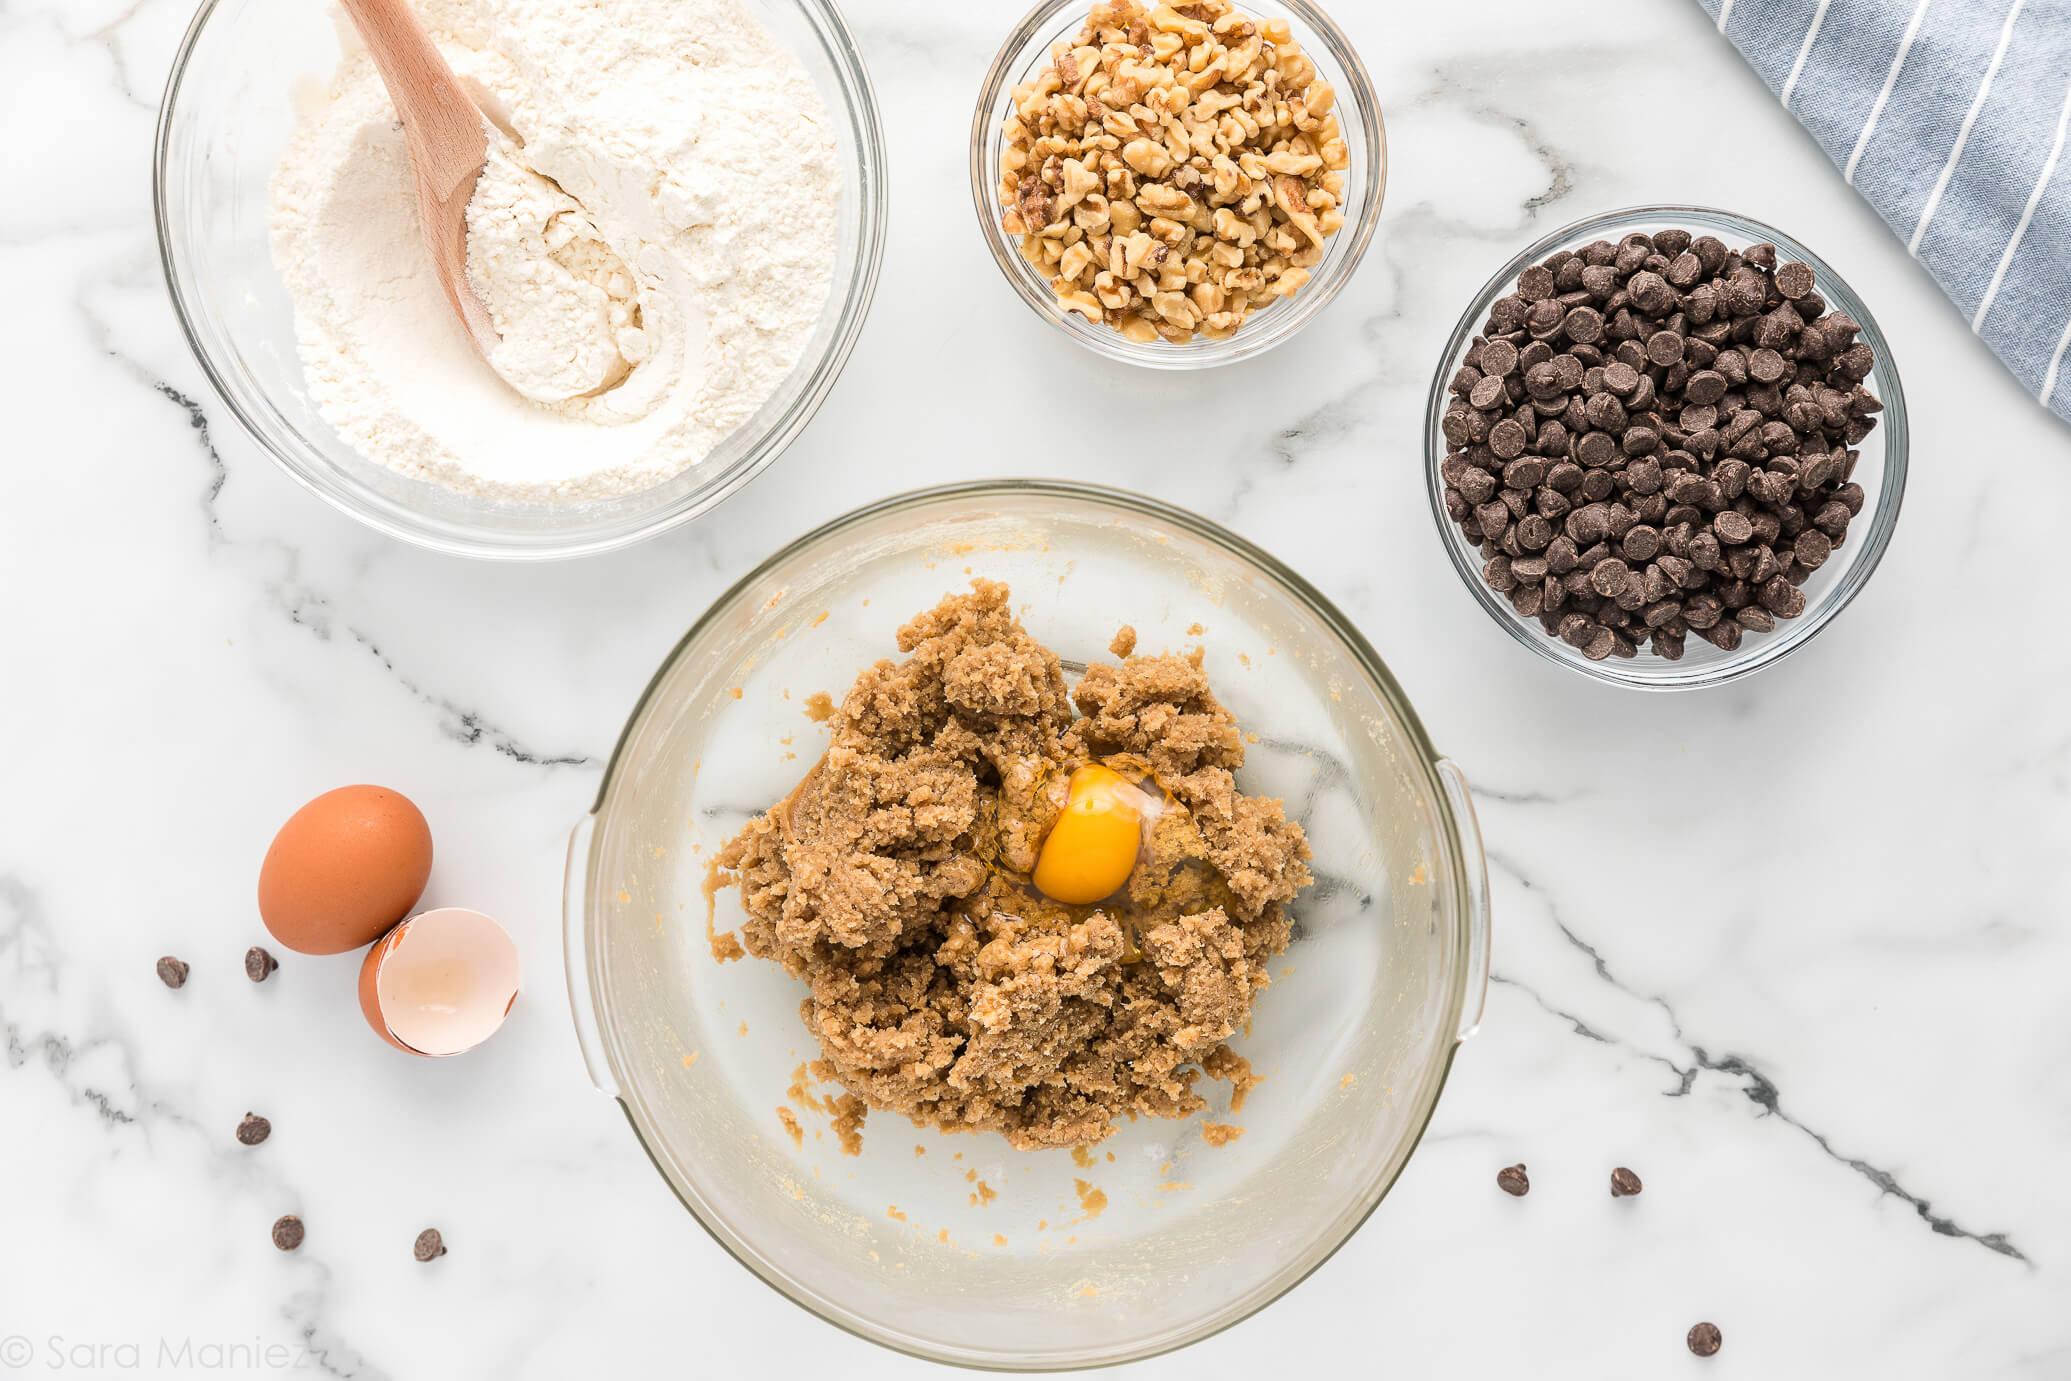 Chocolate Chip Cookies recipe process photo add egg